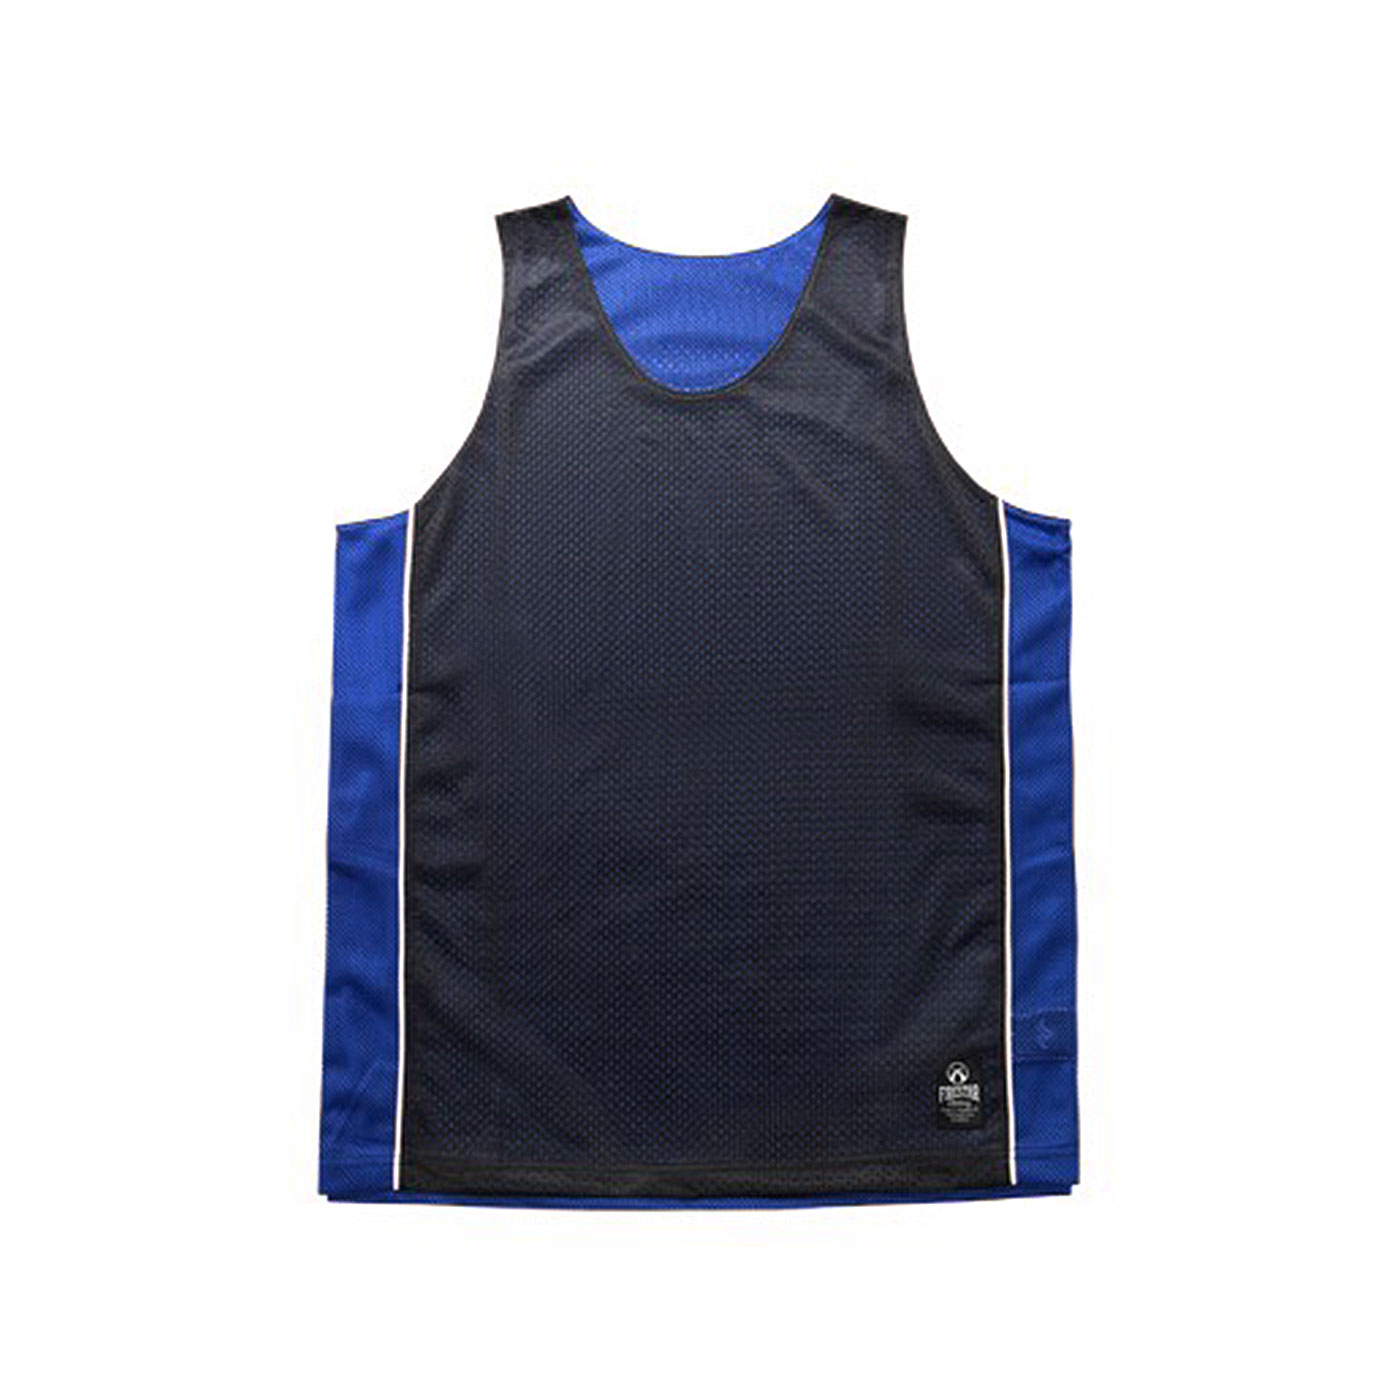 FIRESTAR 籃球背心 B3707-10 - 黑寶藍